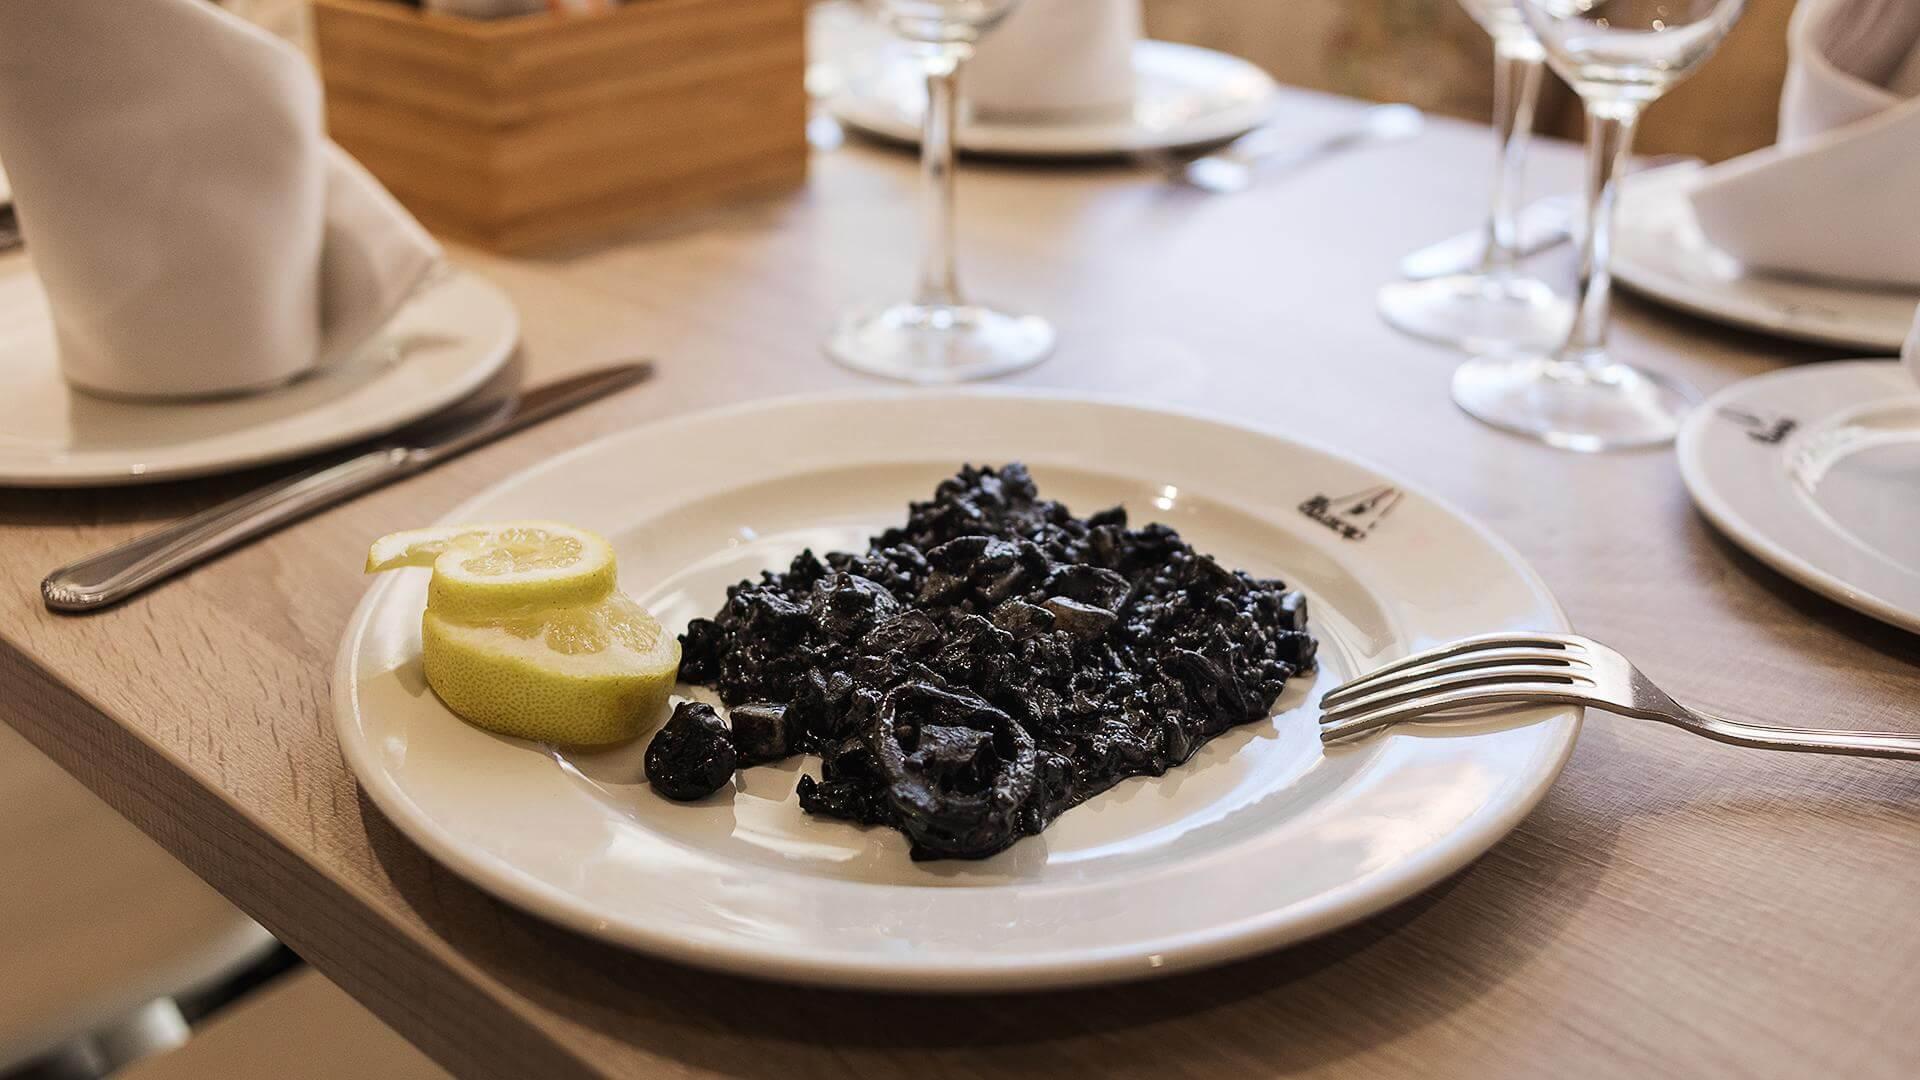 taberna murciana elcaldero arroz negro 1 Taberna murciana en Madrid